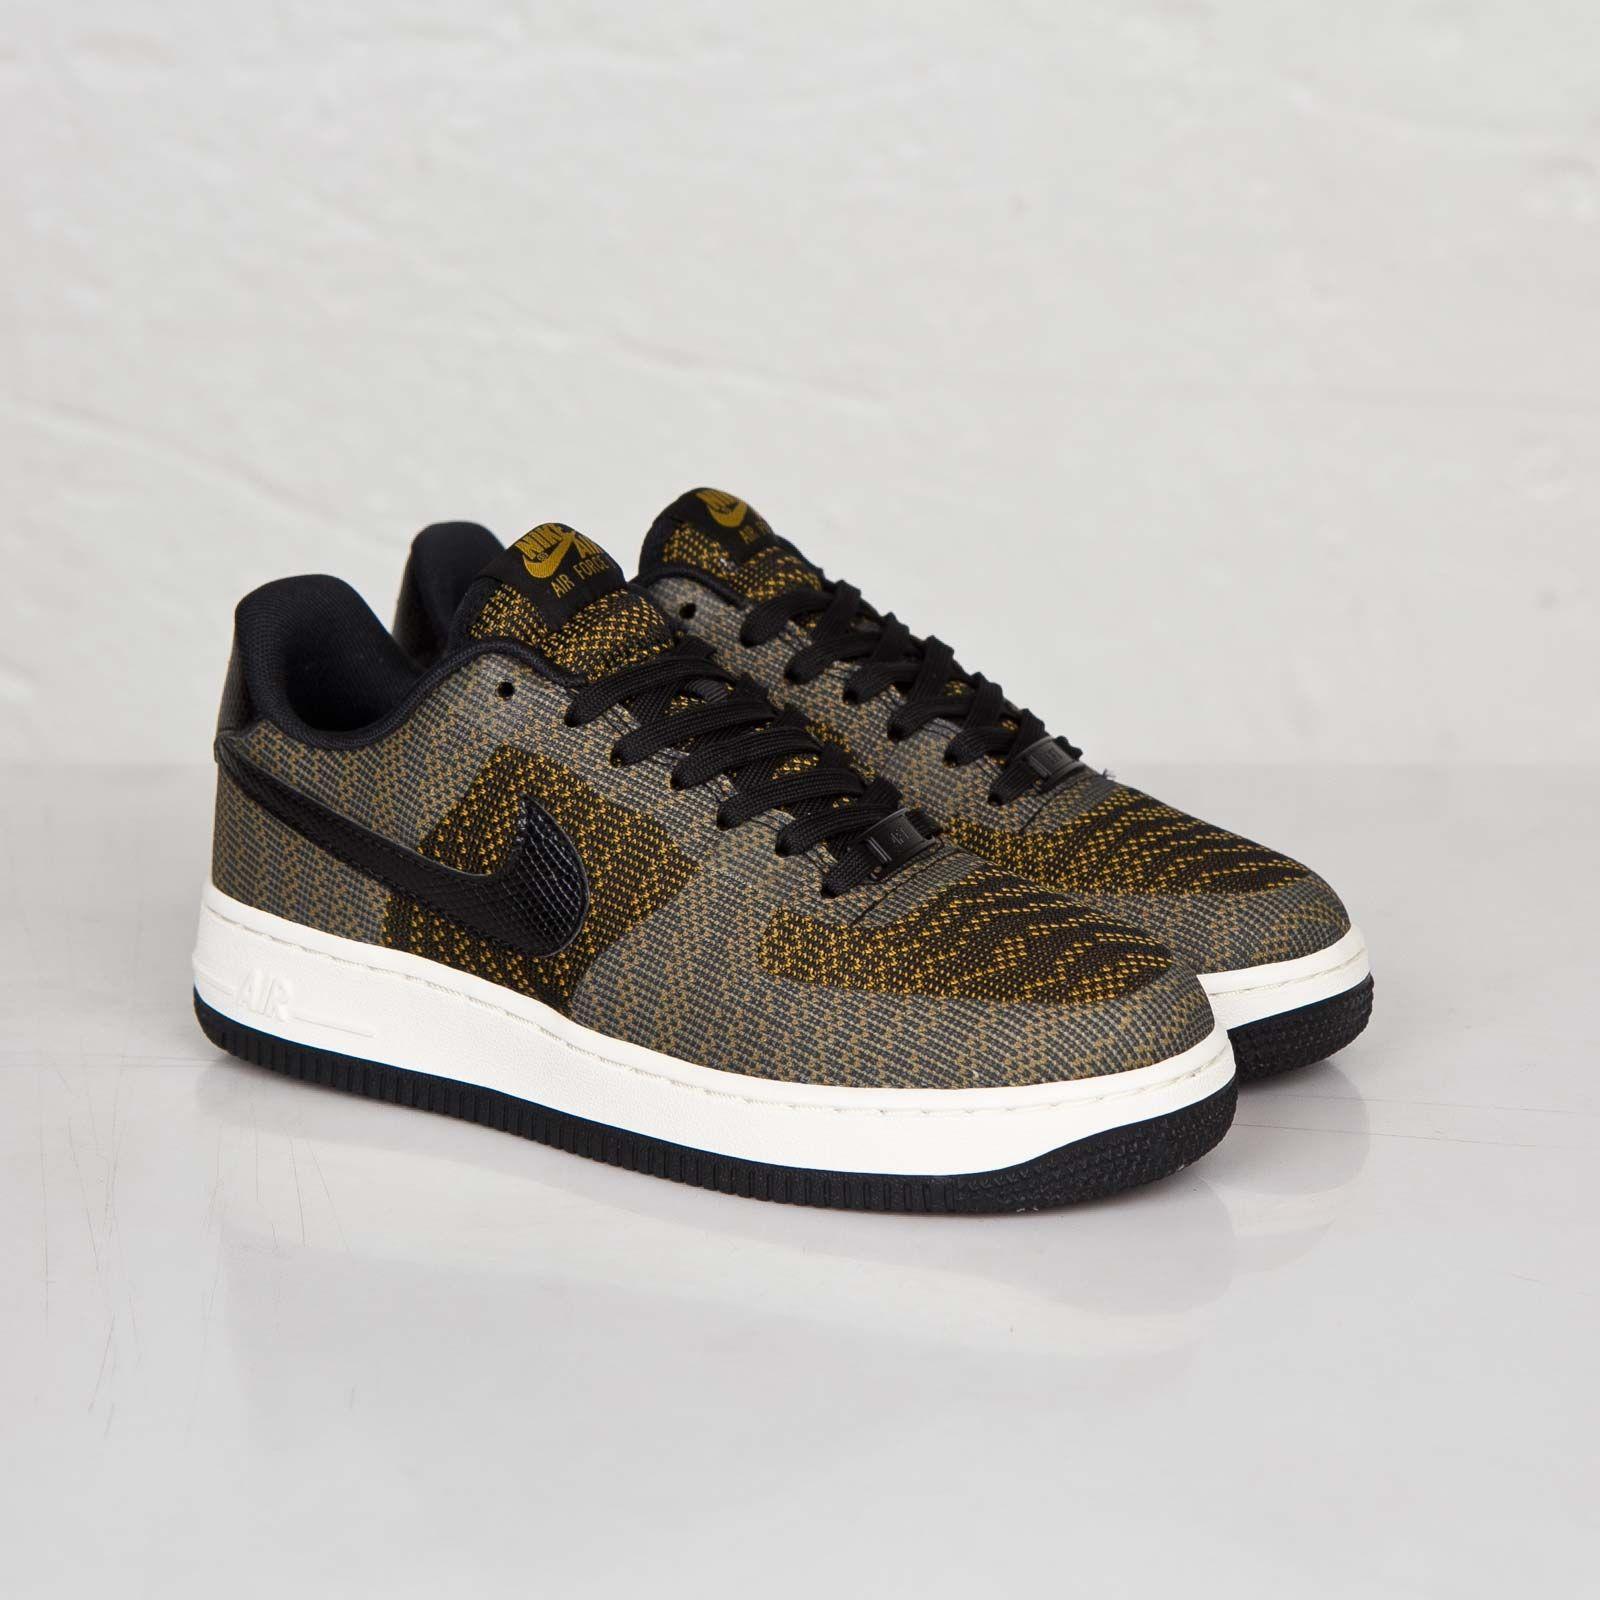 Knit Force 1 Nike W Air JacquardNikeSneakers Och ´07 PuXikTOZ